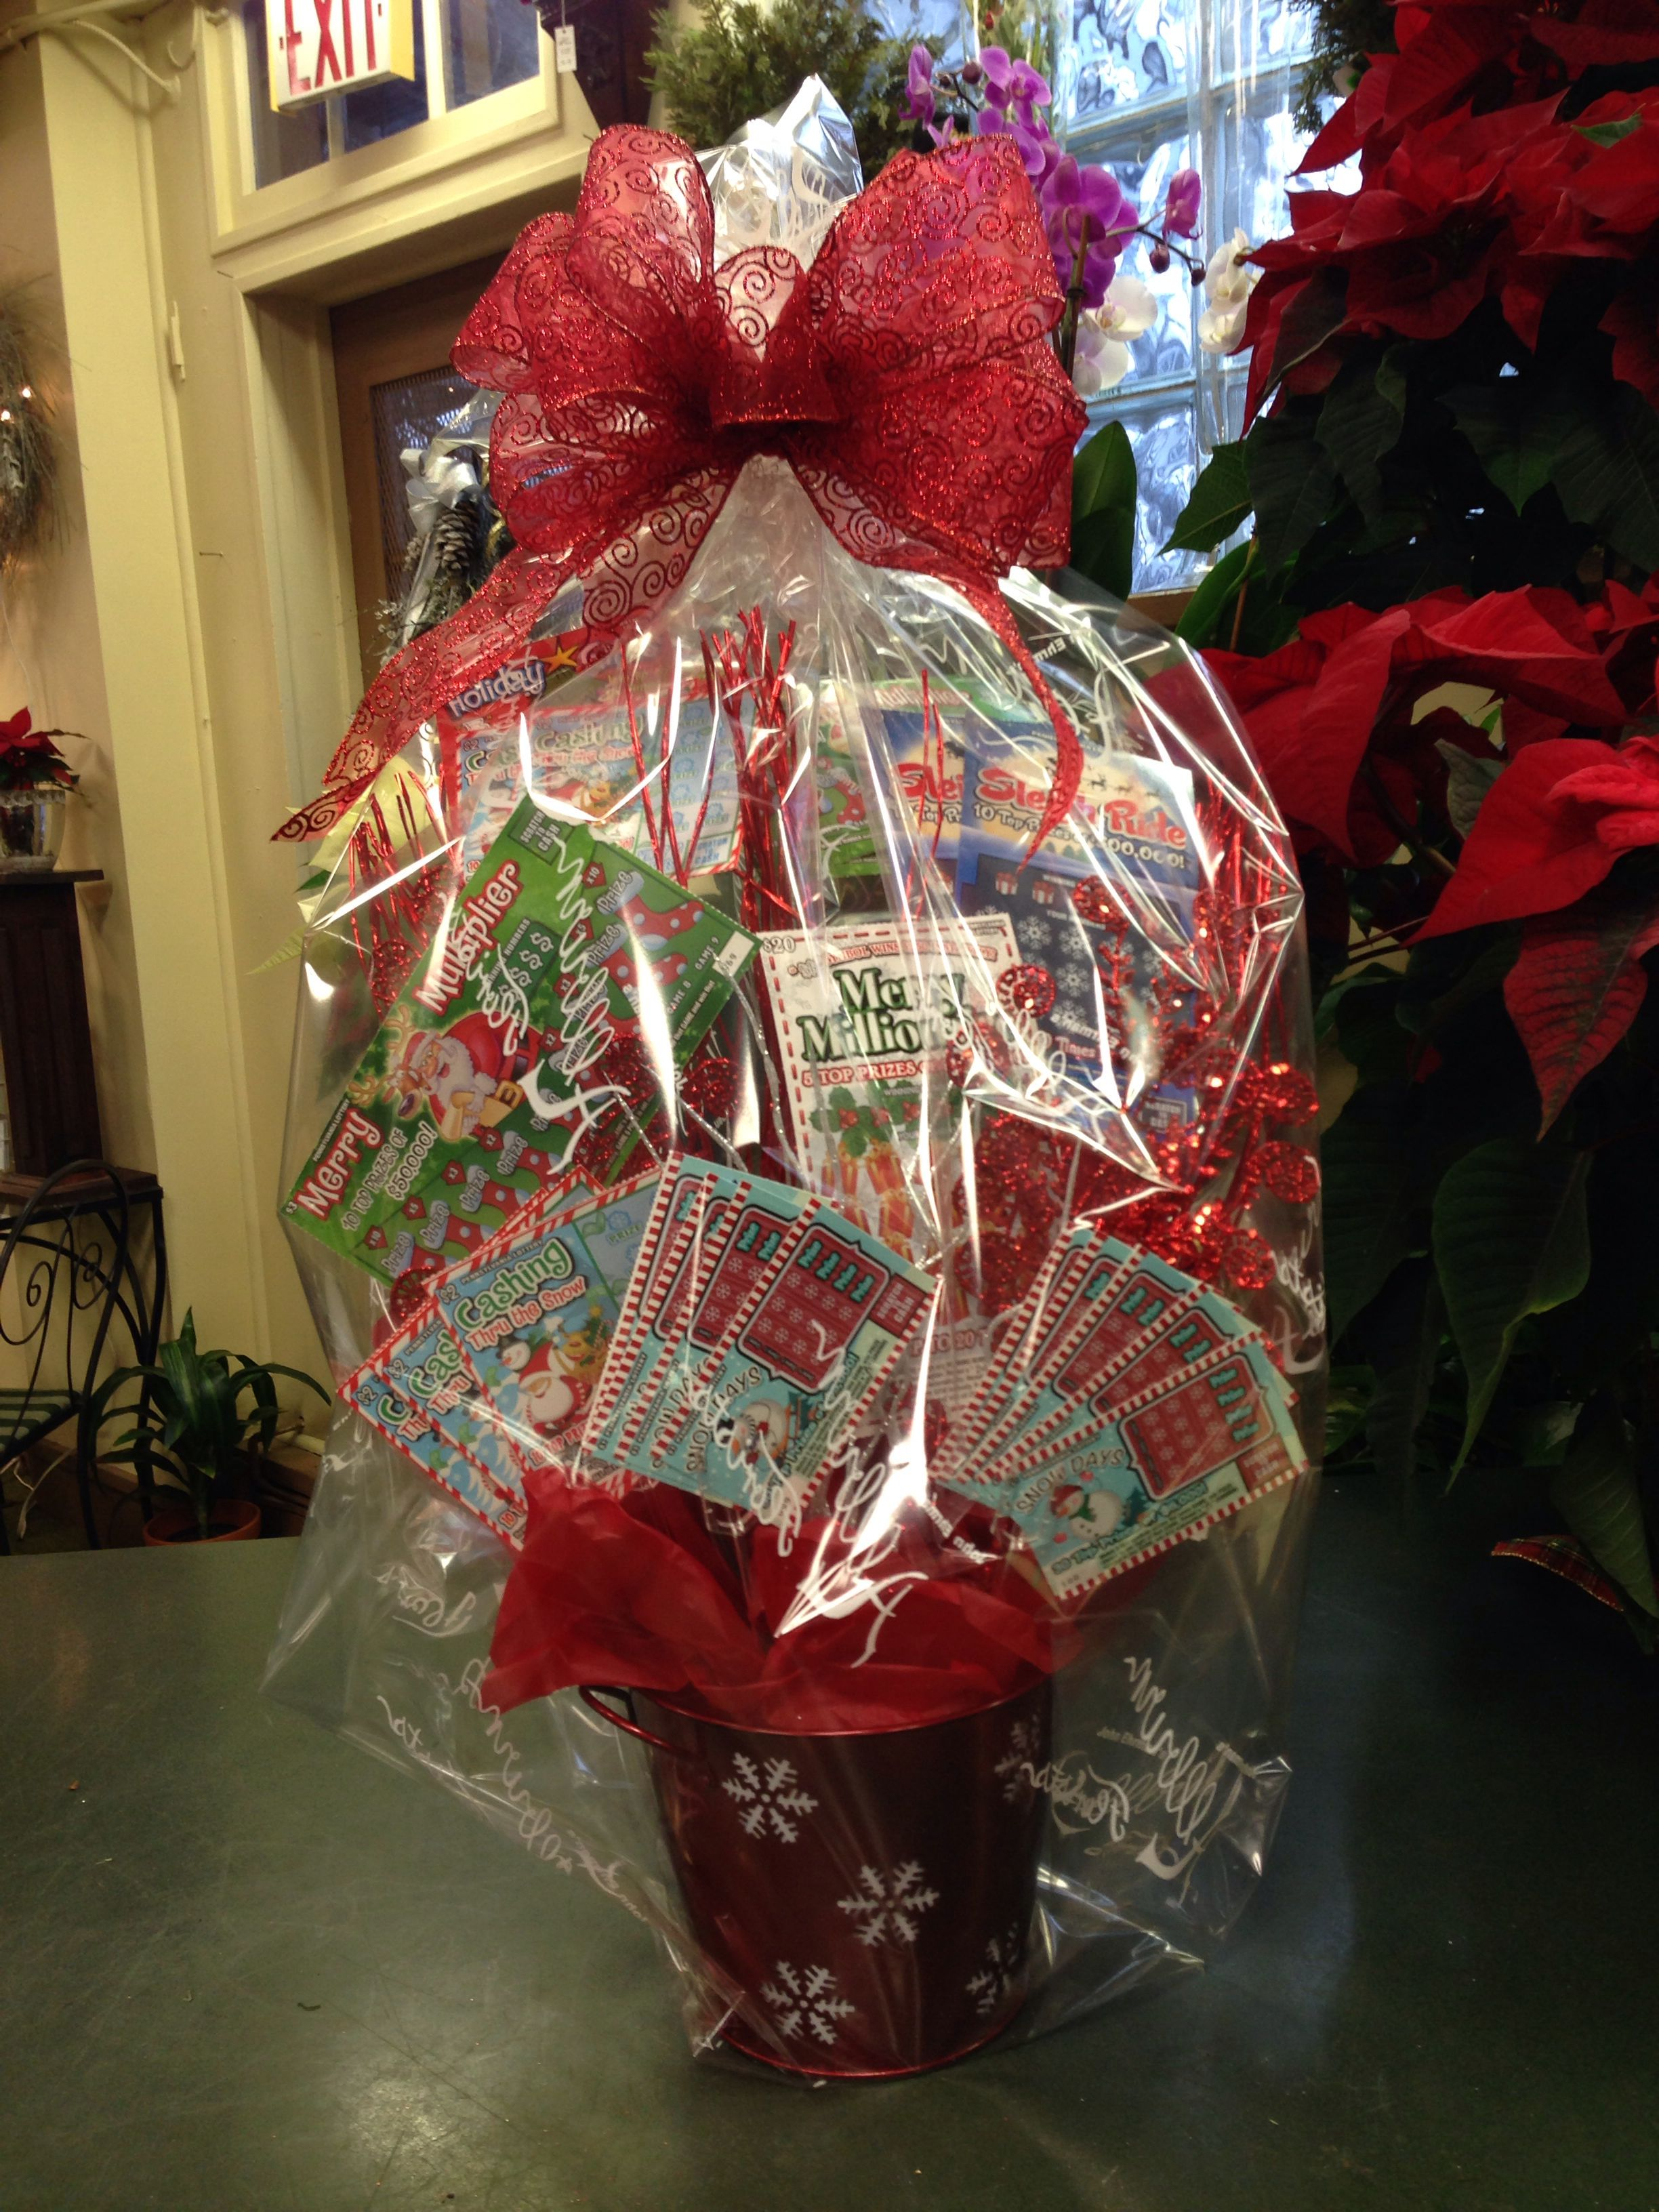 Lottery ticket basket themed gift baskets raffle